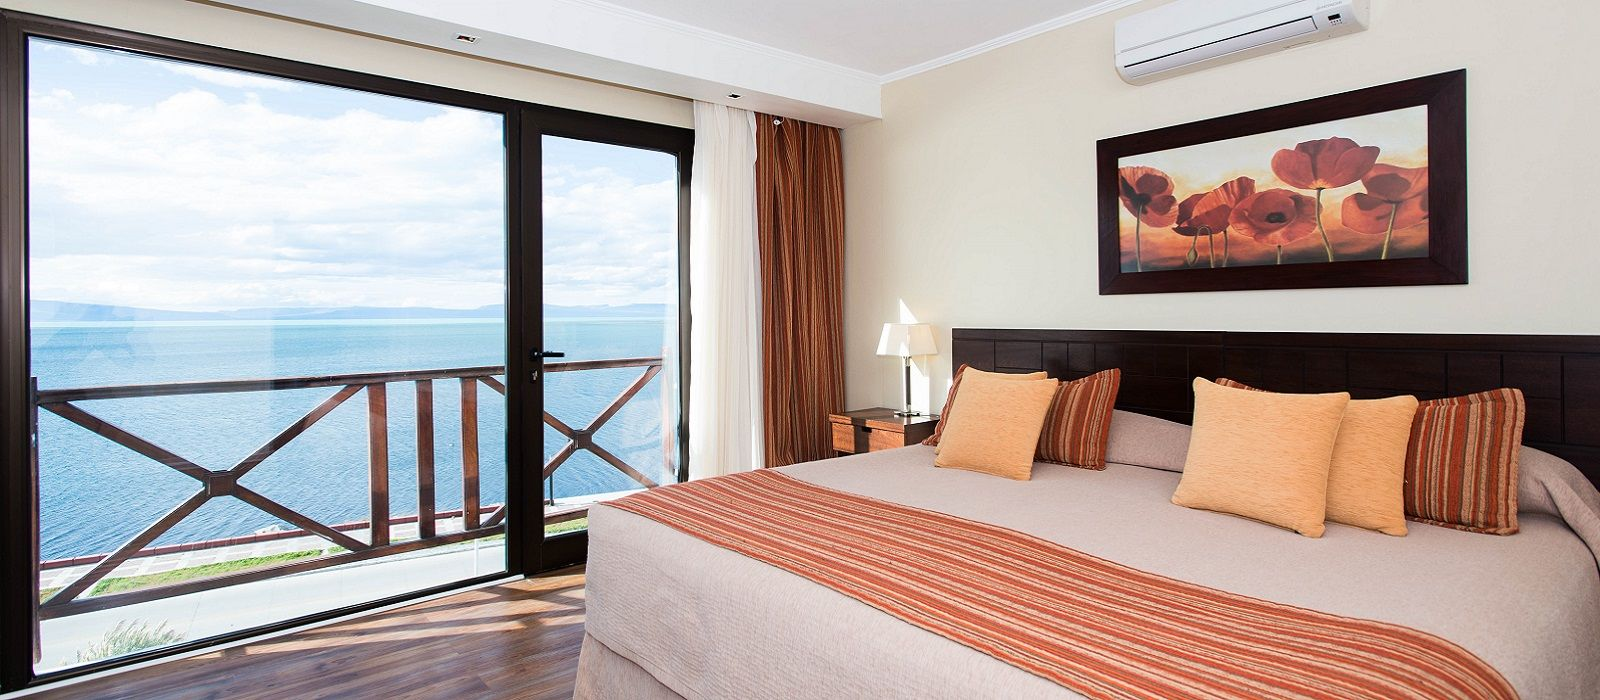 Hotel Xelena  & Suites Argentina